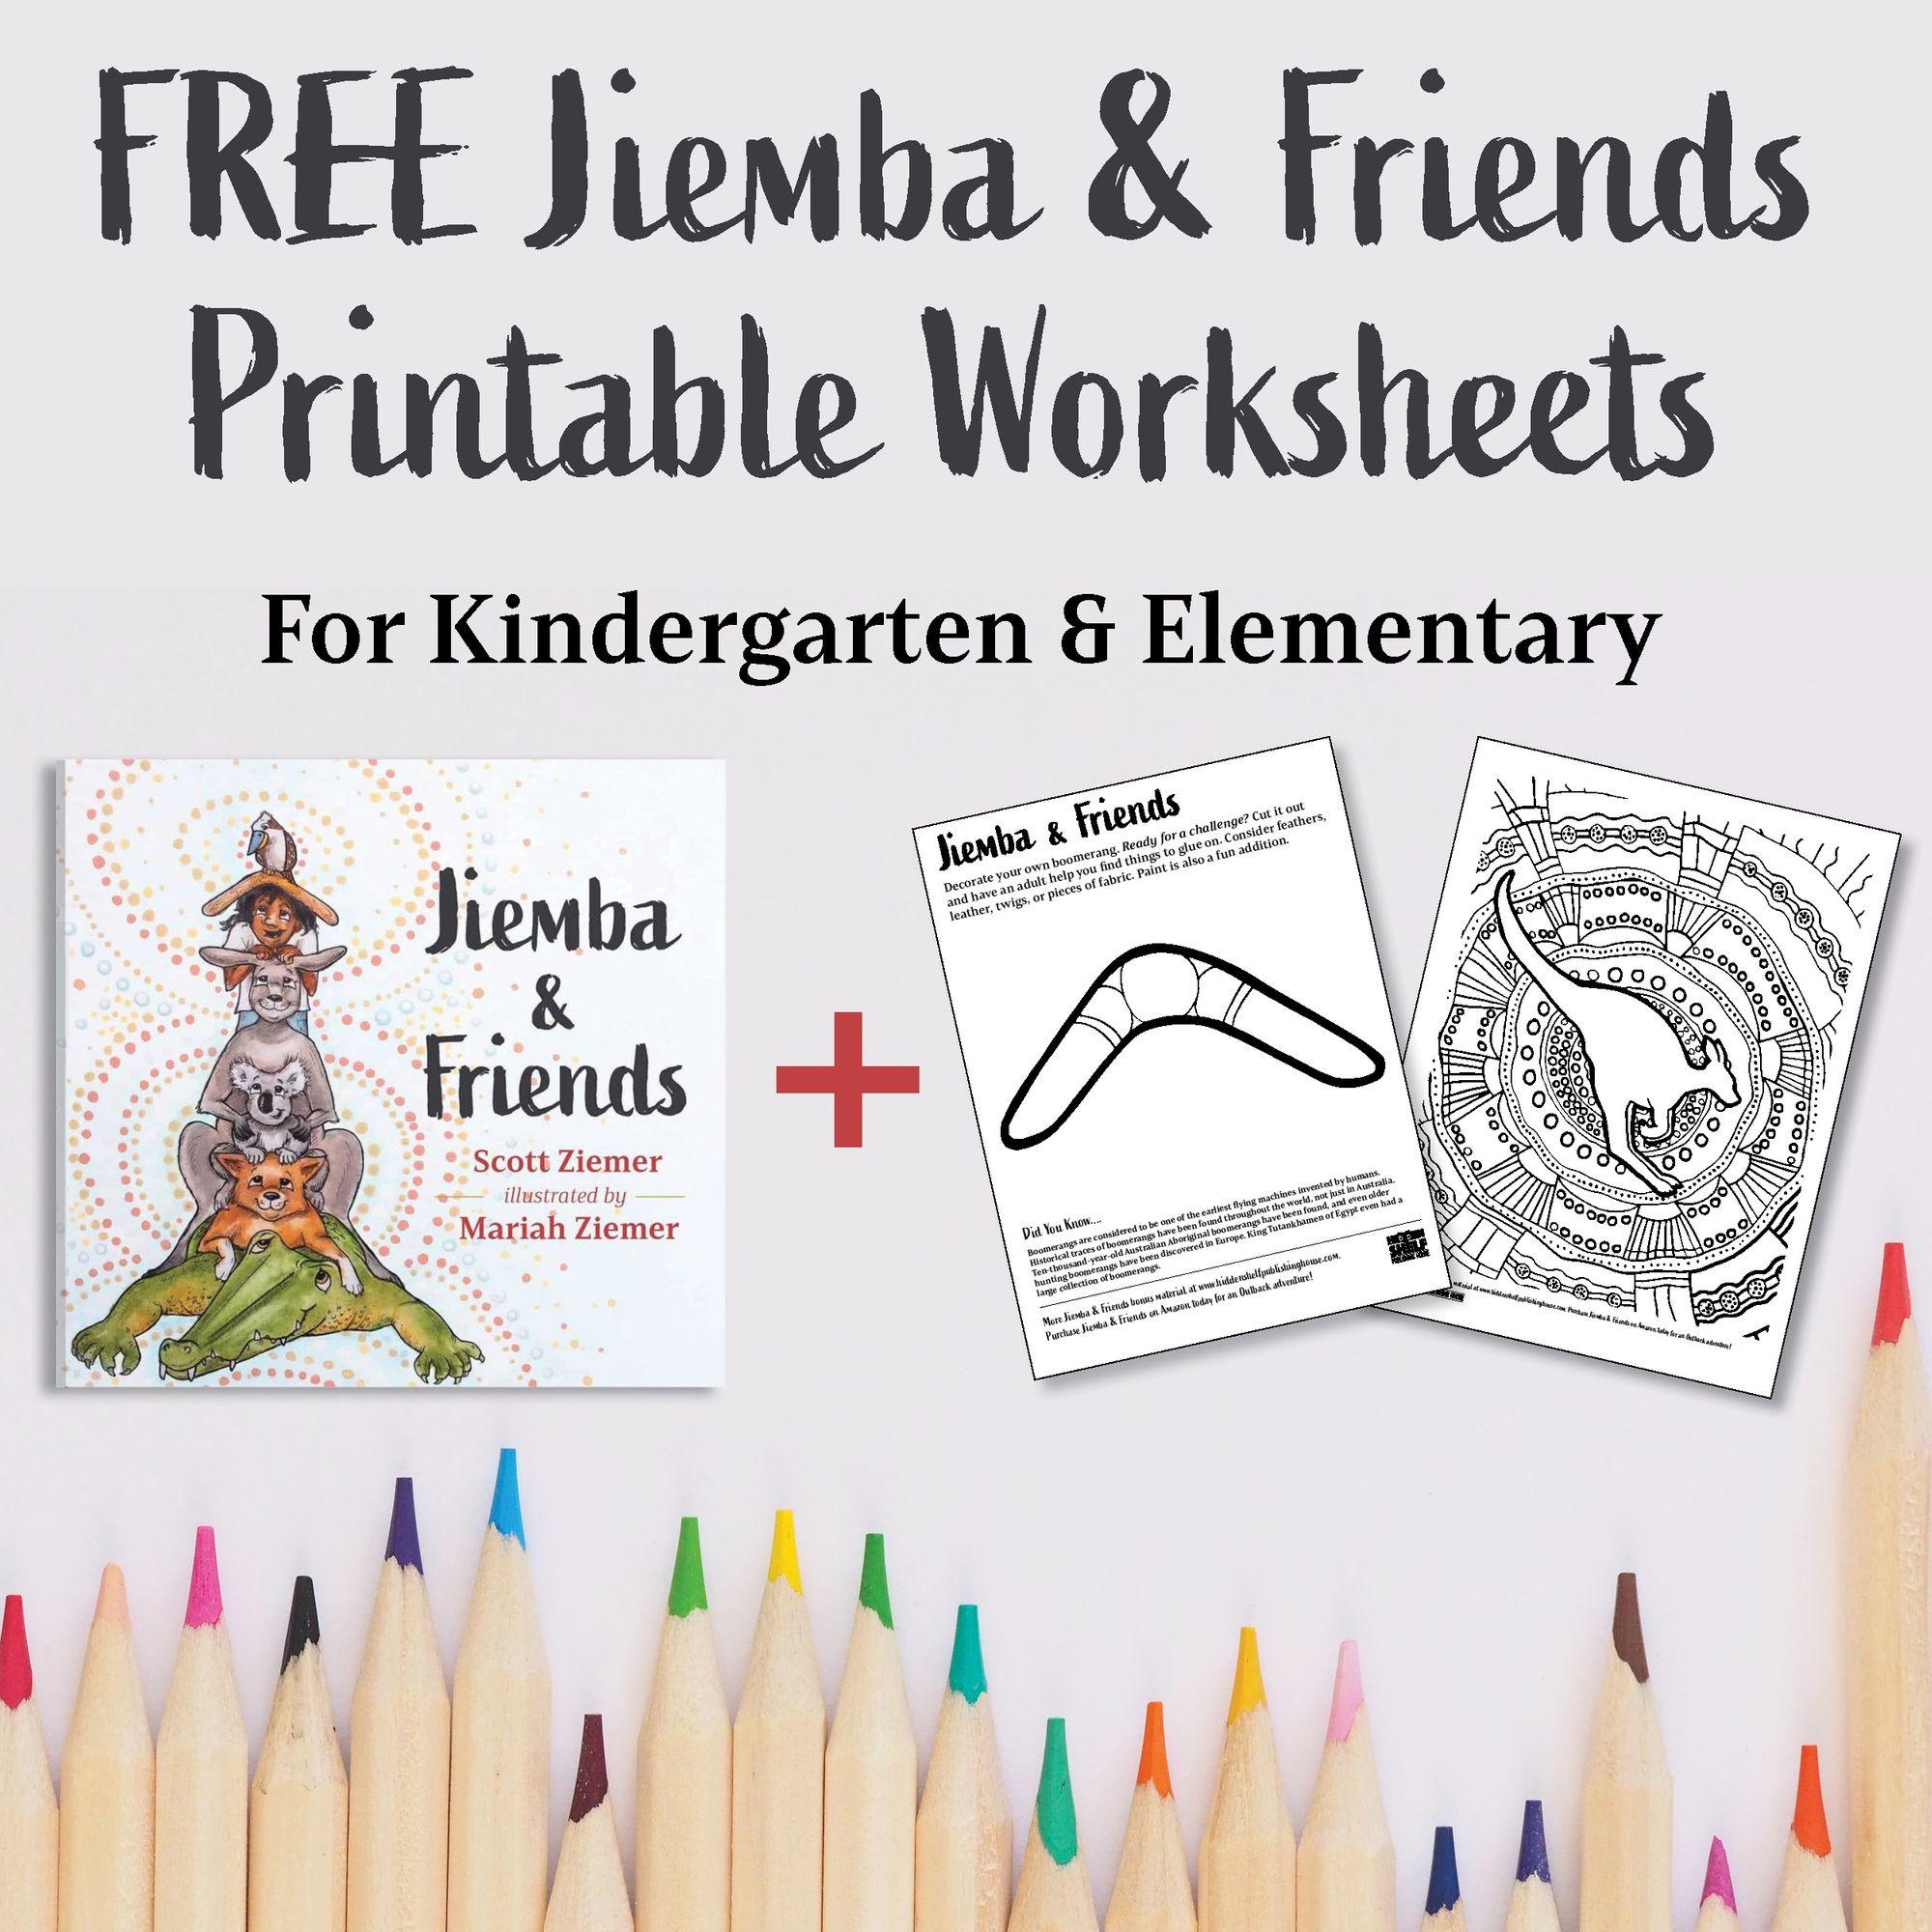 Predownload: Free Printable Worksheets For Kindergarten Kindergarten Worksheets Printable Kindergarten Worksheets Free Printable Worksheets [ 2000 x 2000 Pixel ]